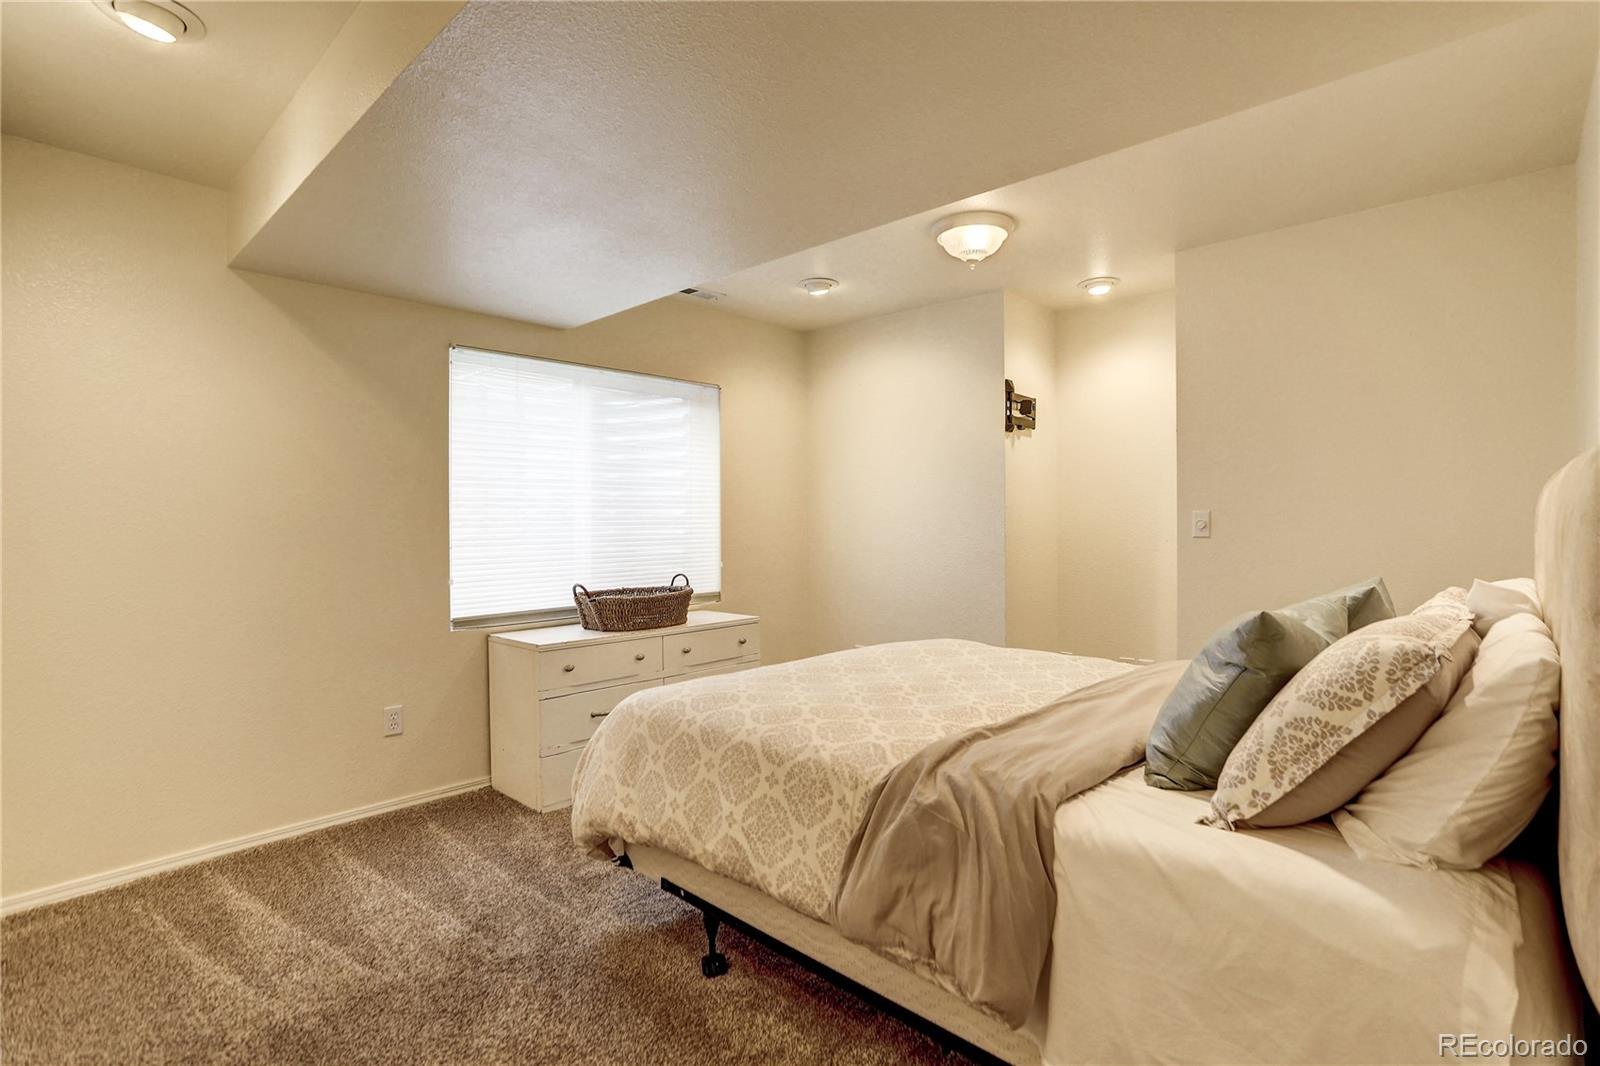 MLS# 9497145 - 28 - 4960 Squirreltail Drive, Colorado Springs, CO 80920